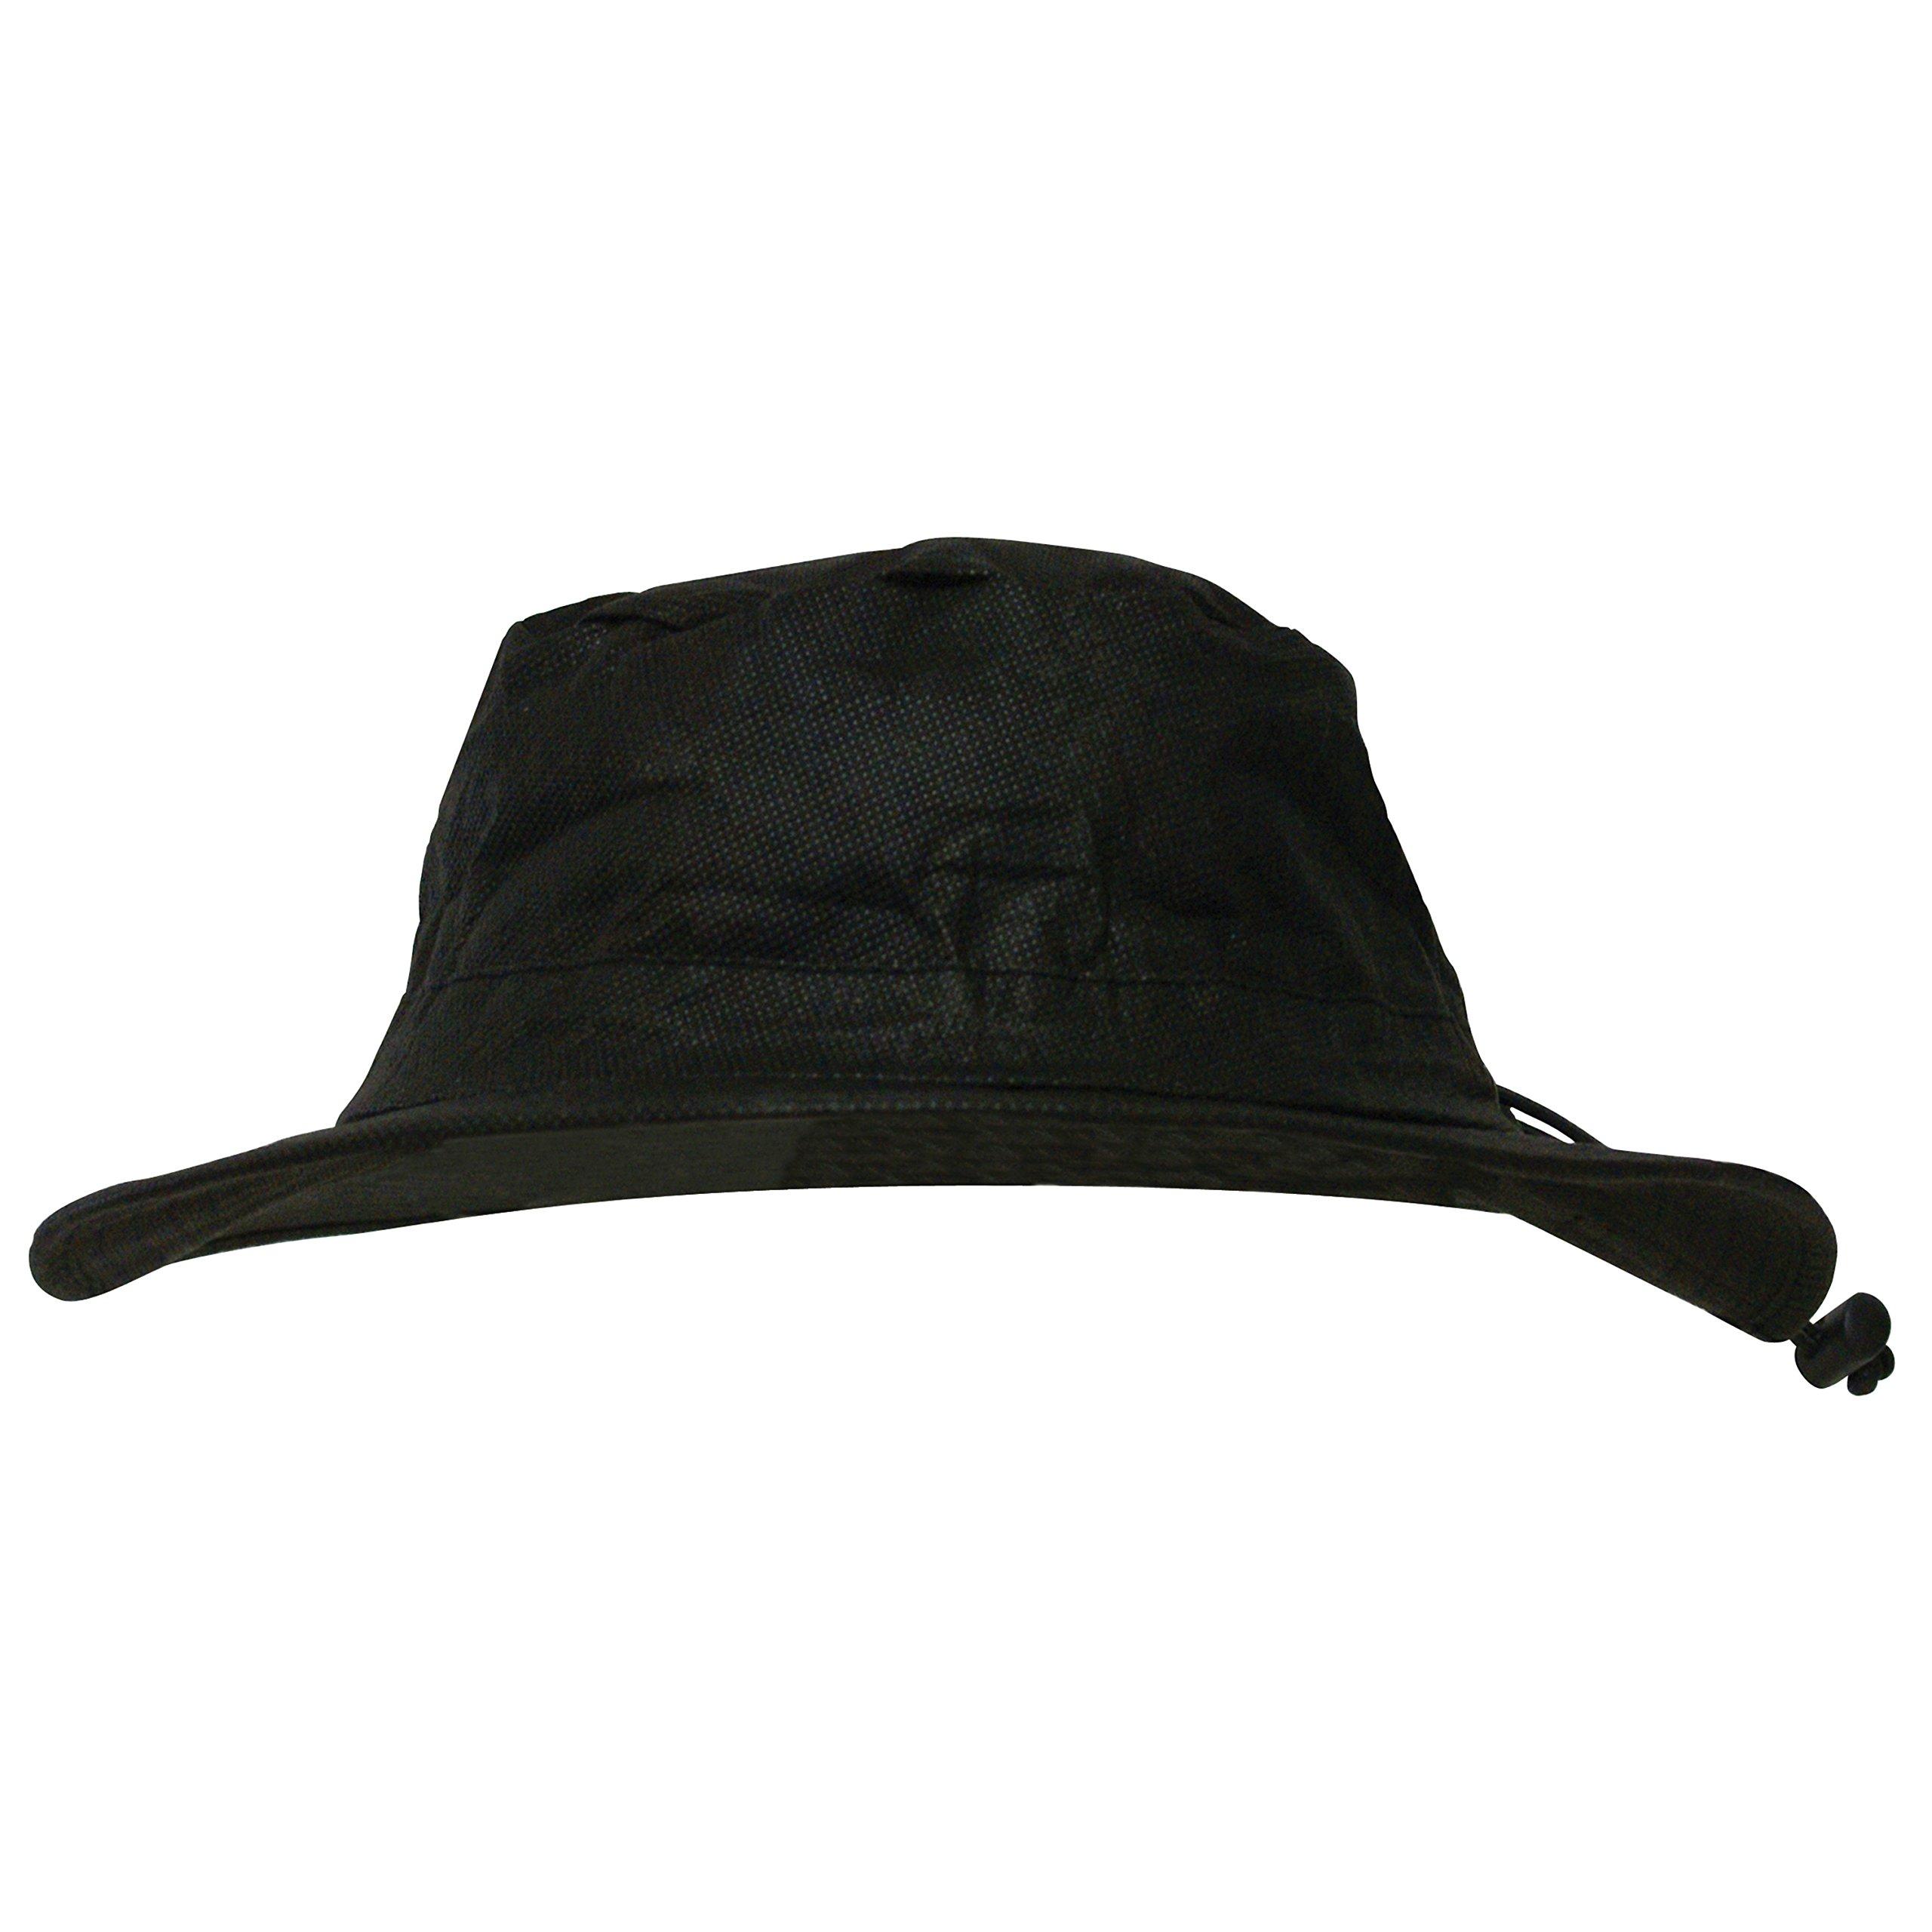 Frogg Toggs Waterproof Breathable Bucket Hat, Black, Adjustable